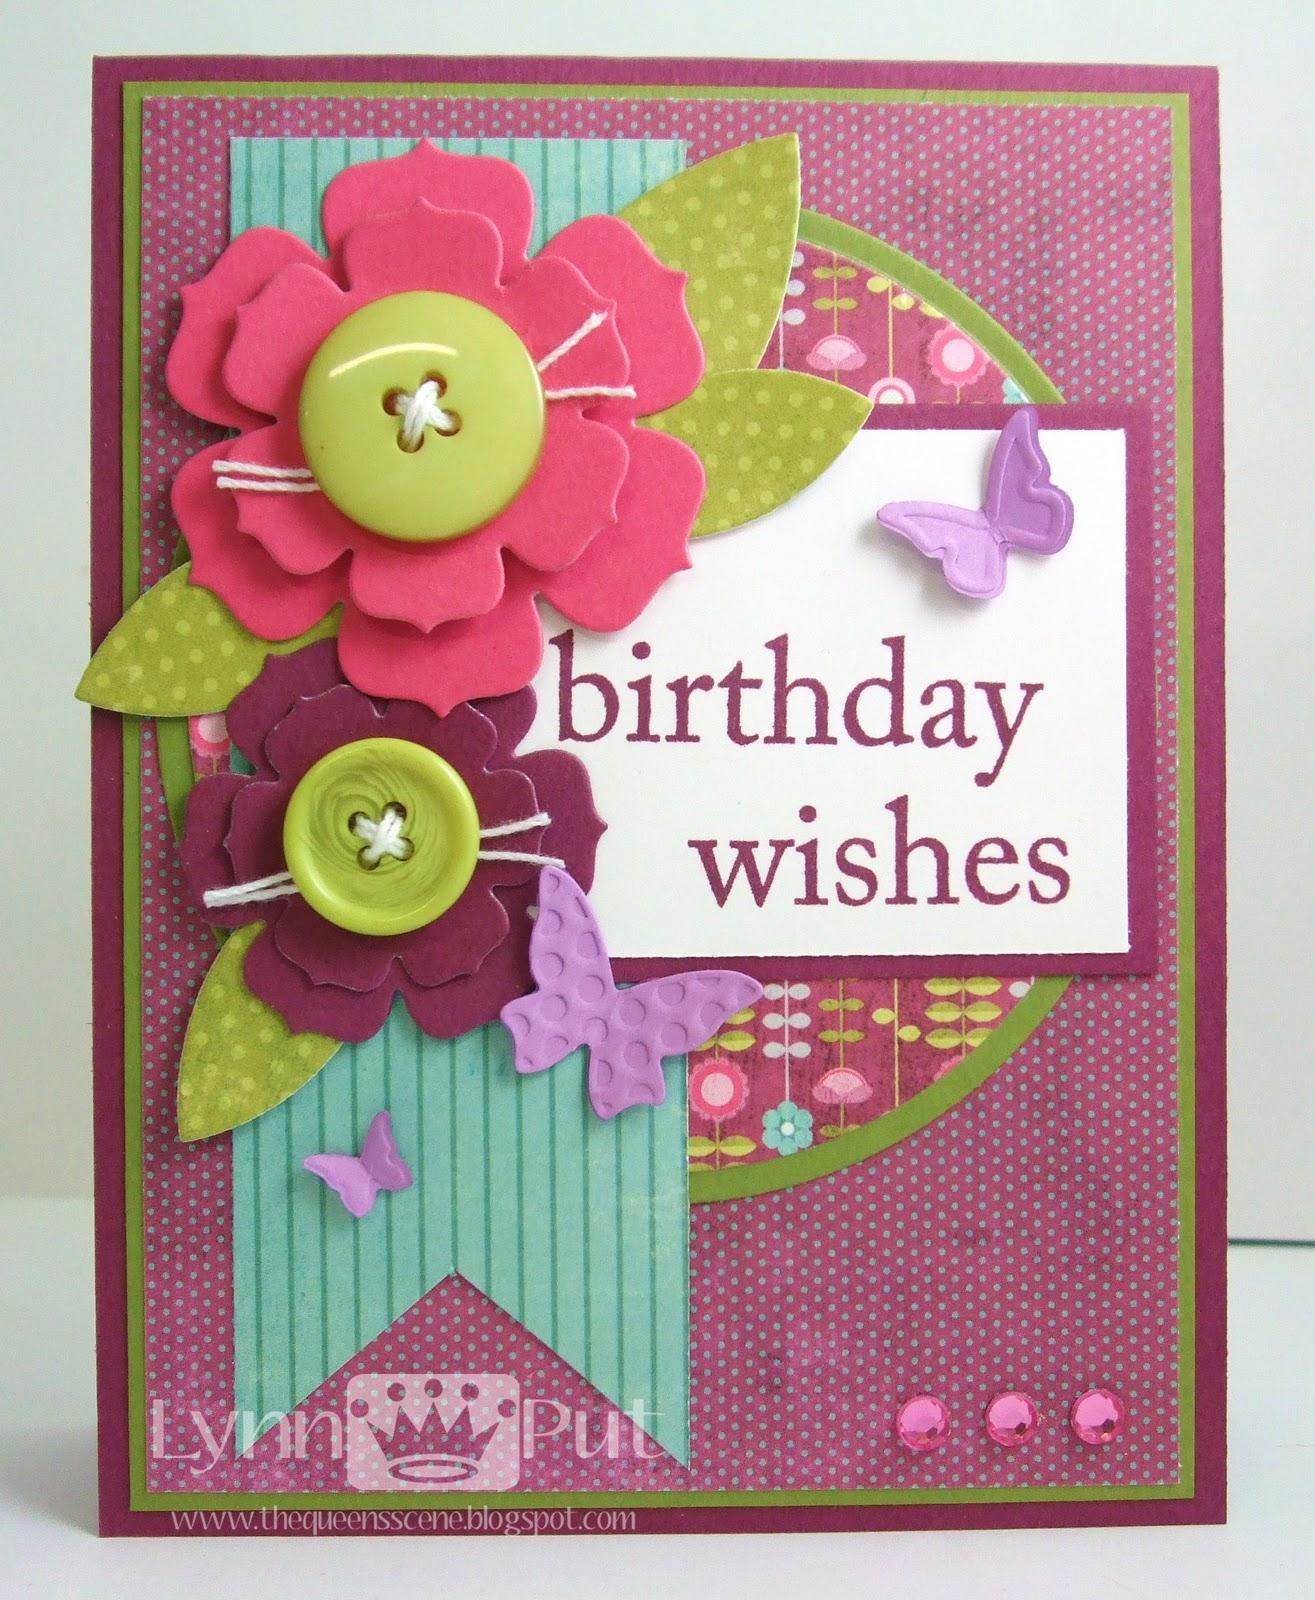 http://4.bp.blogspot.com/-wAtwKzNGyBA/ToHc96iD5eI/AAAAAAAAE0E/xCEkHJFWCpQ/s1600/PTI+Bonnie%2527s+Birthday+Card+copy.jpg